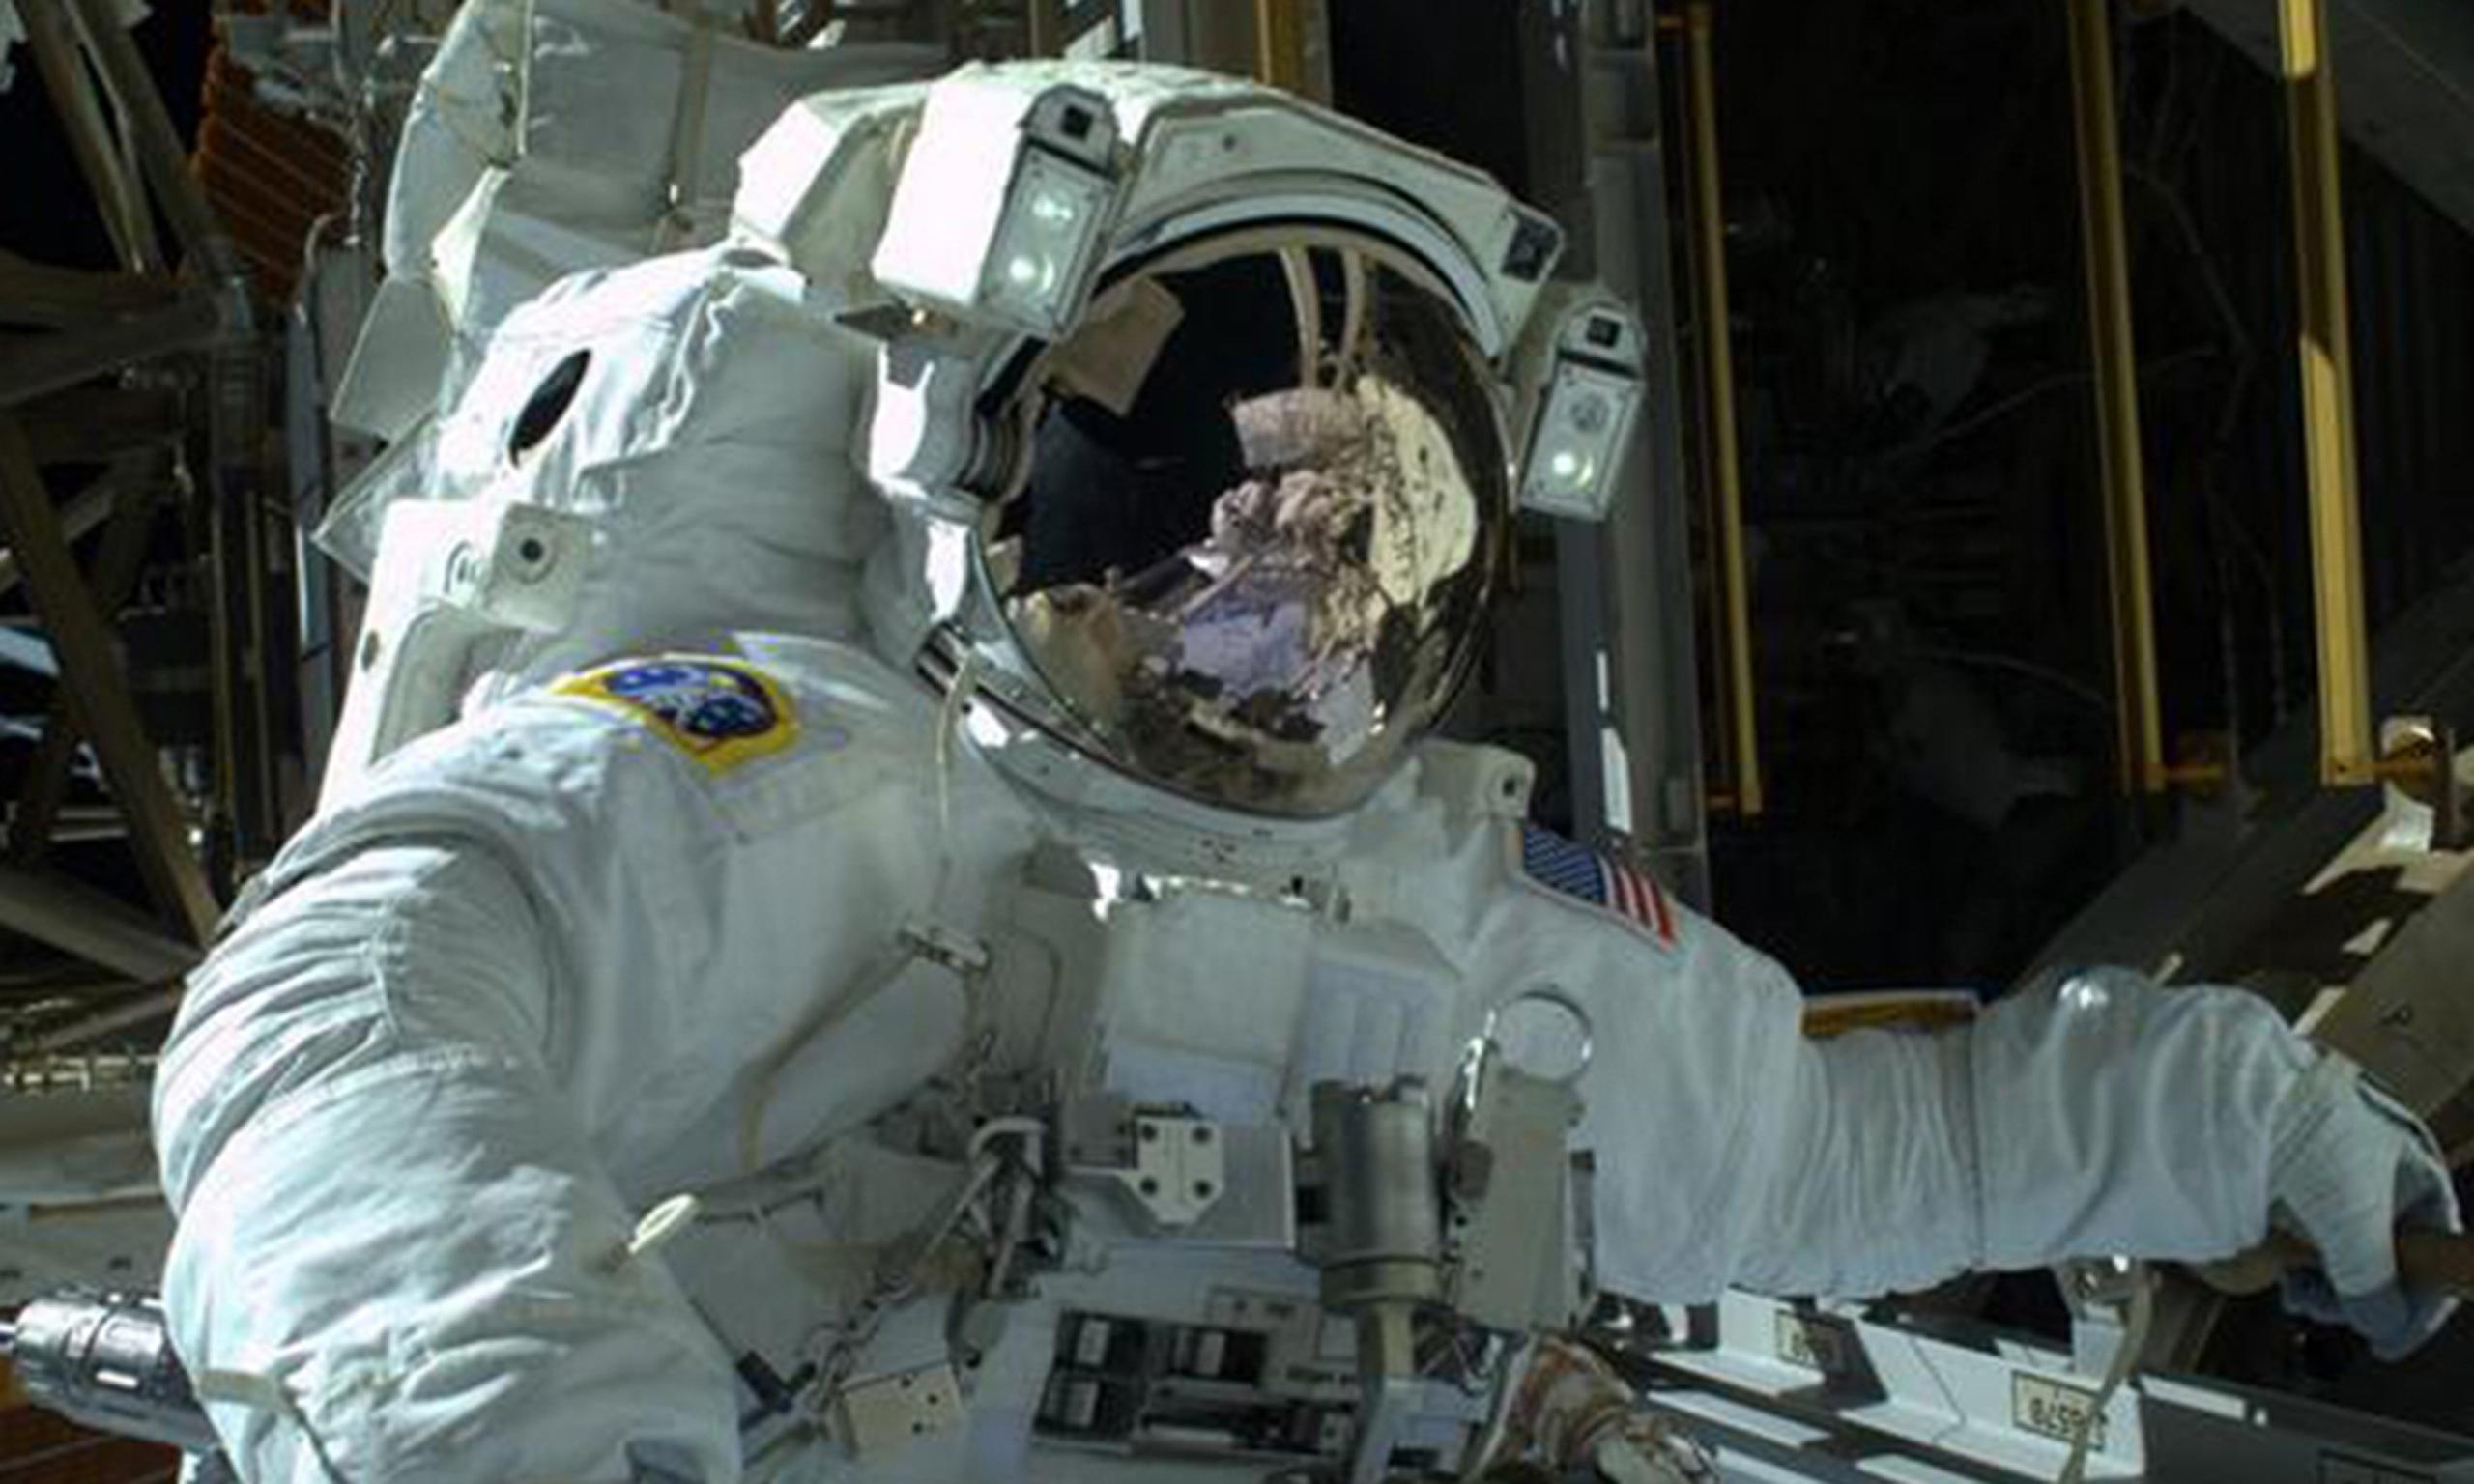 international space station astronaut spacewalk - photo #24